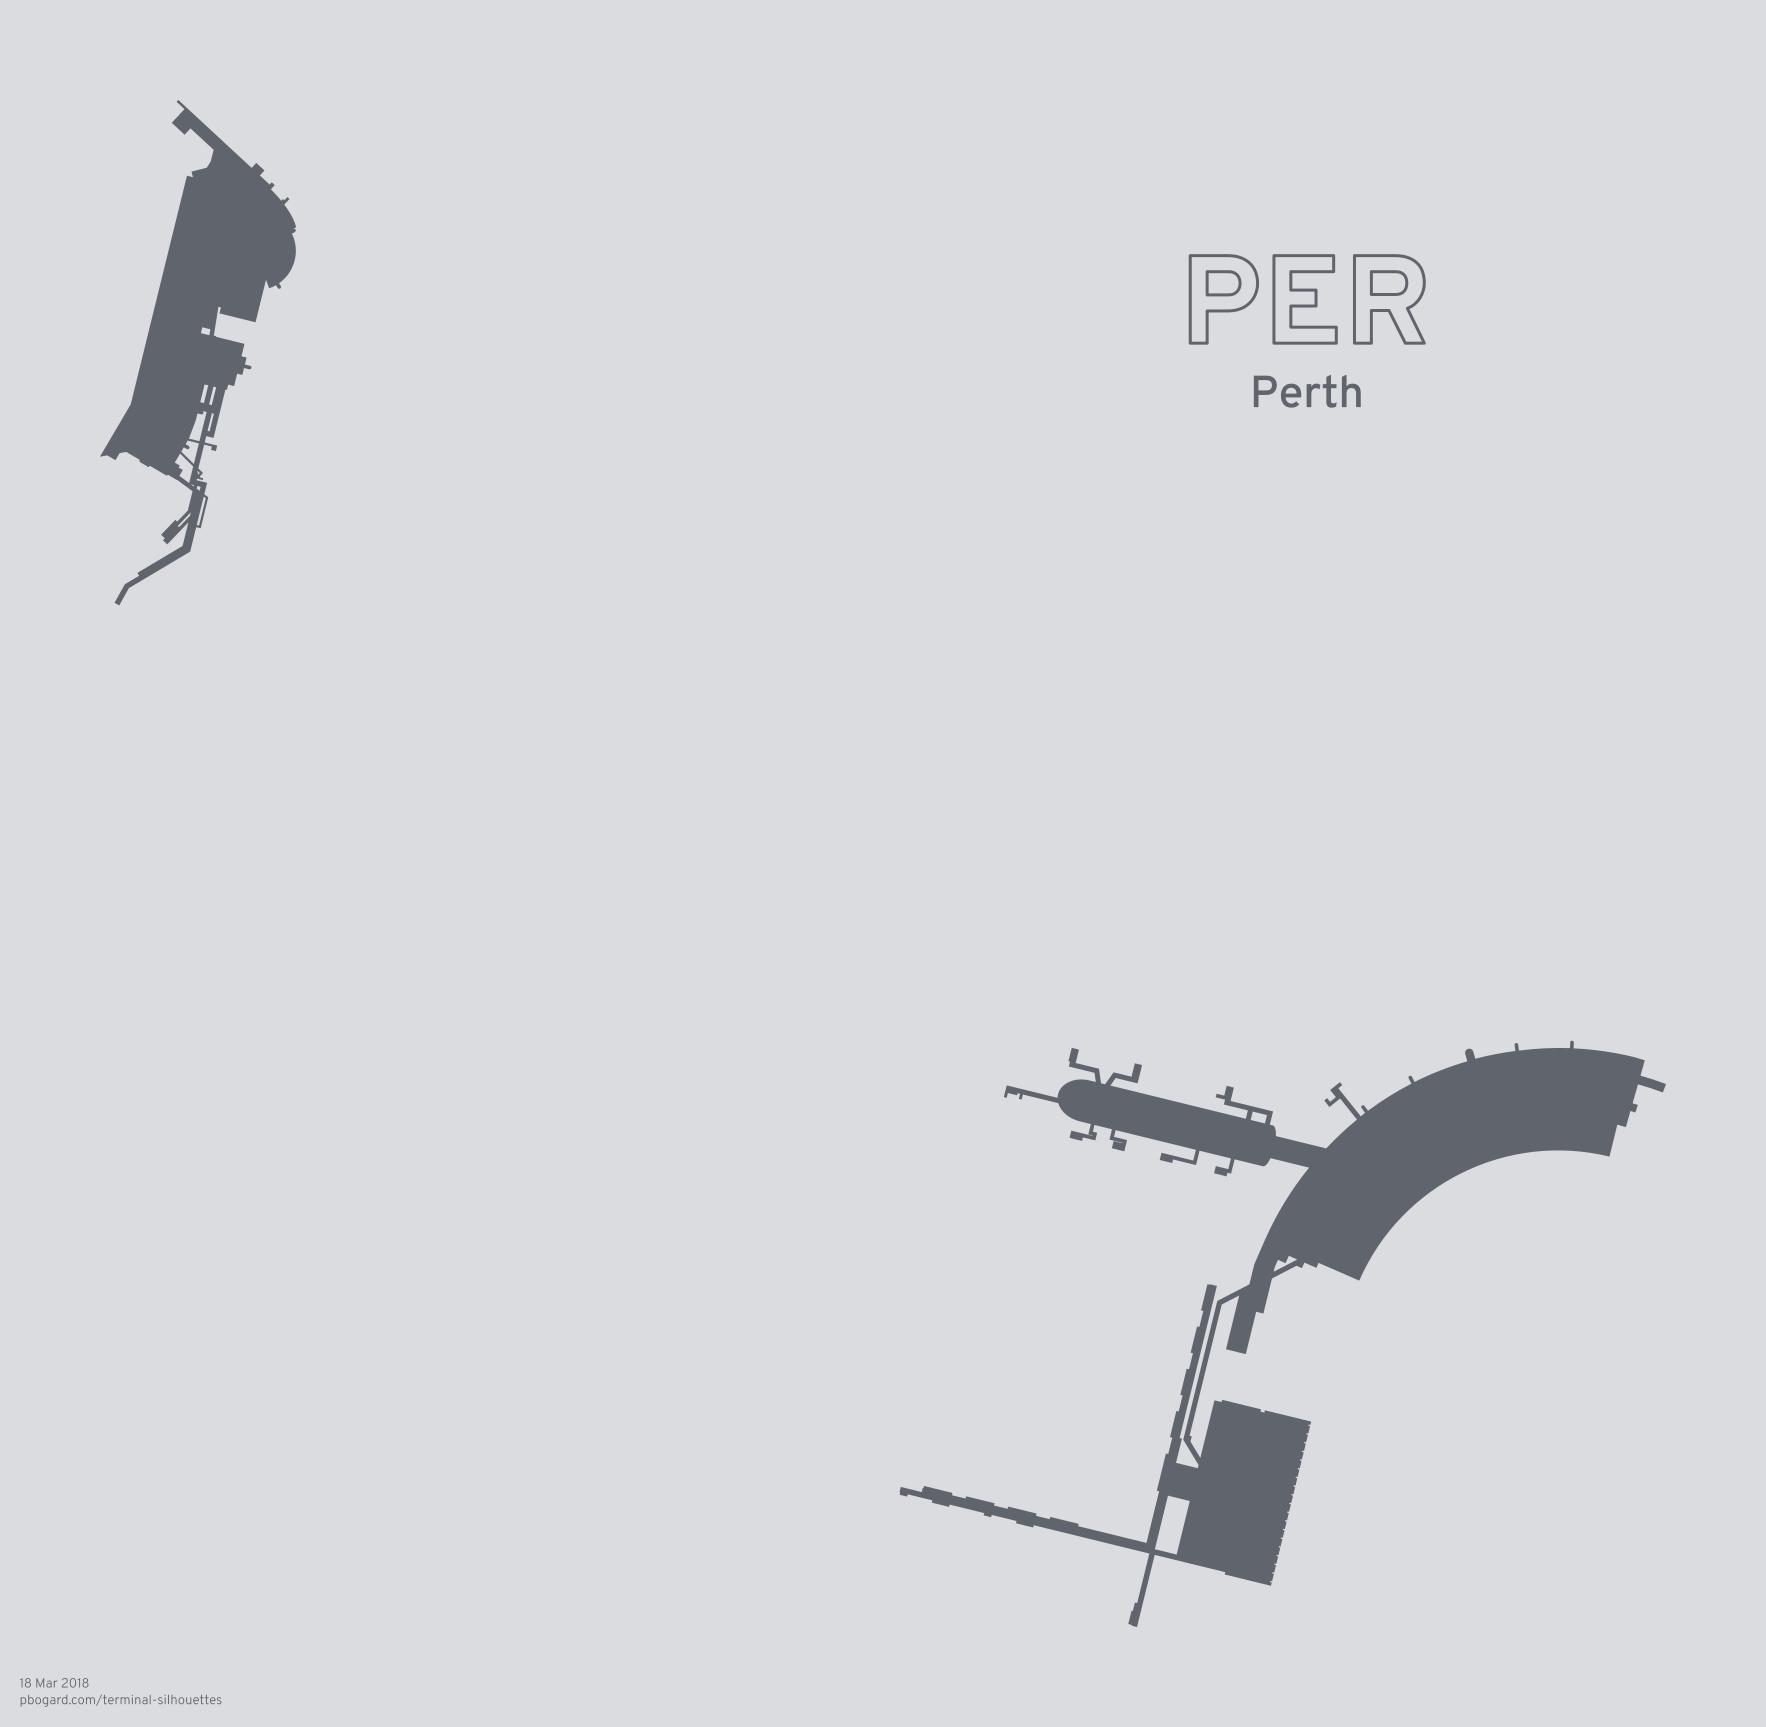 Terminal silhouette of PER (Perth)